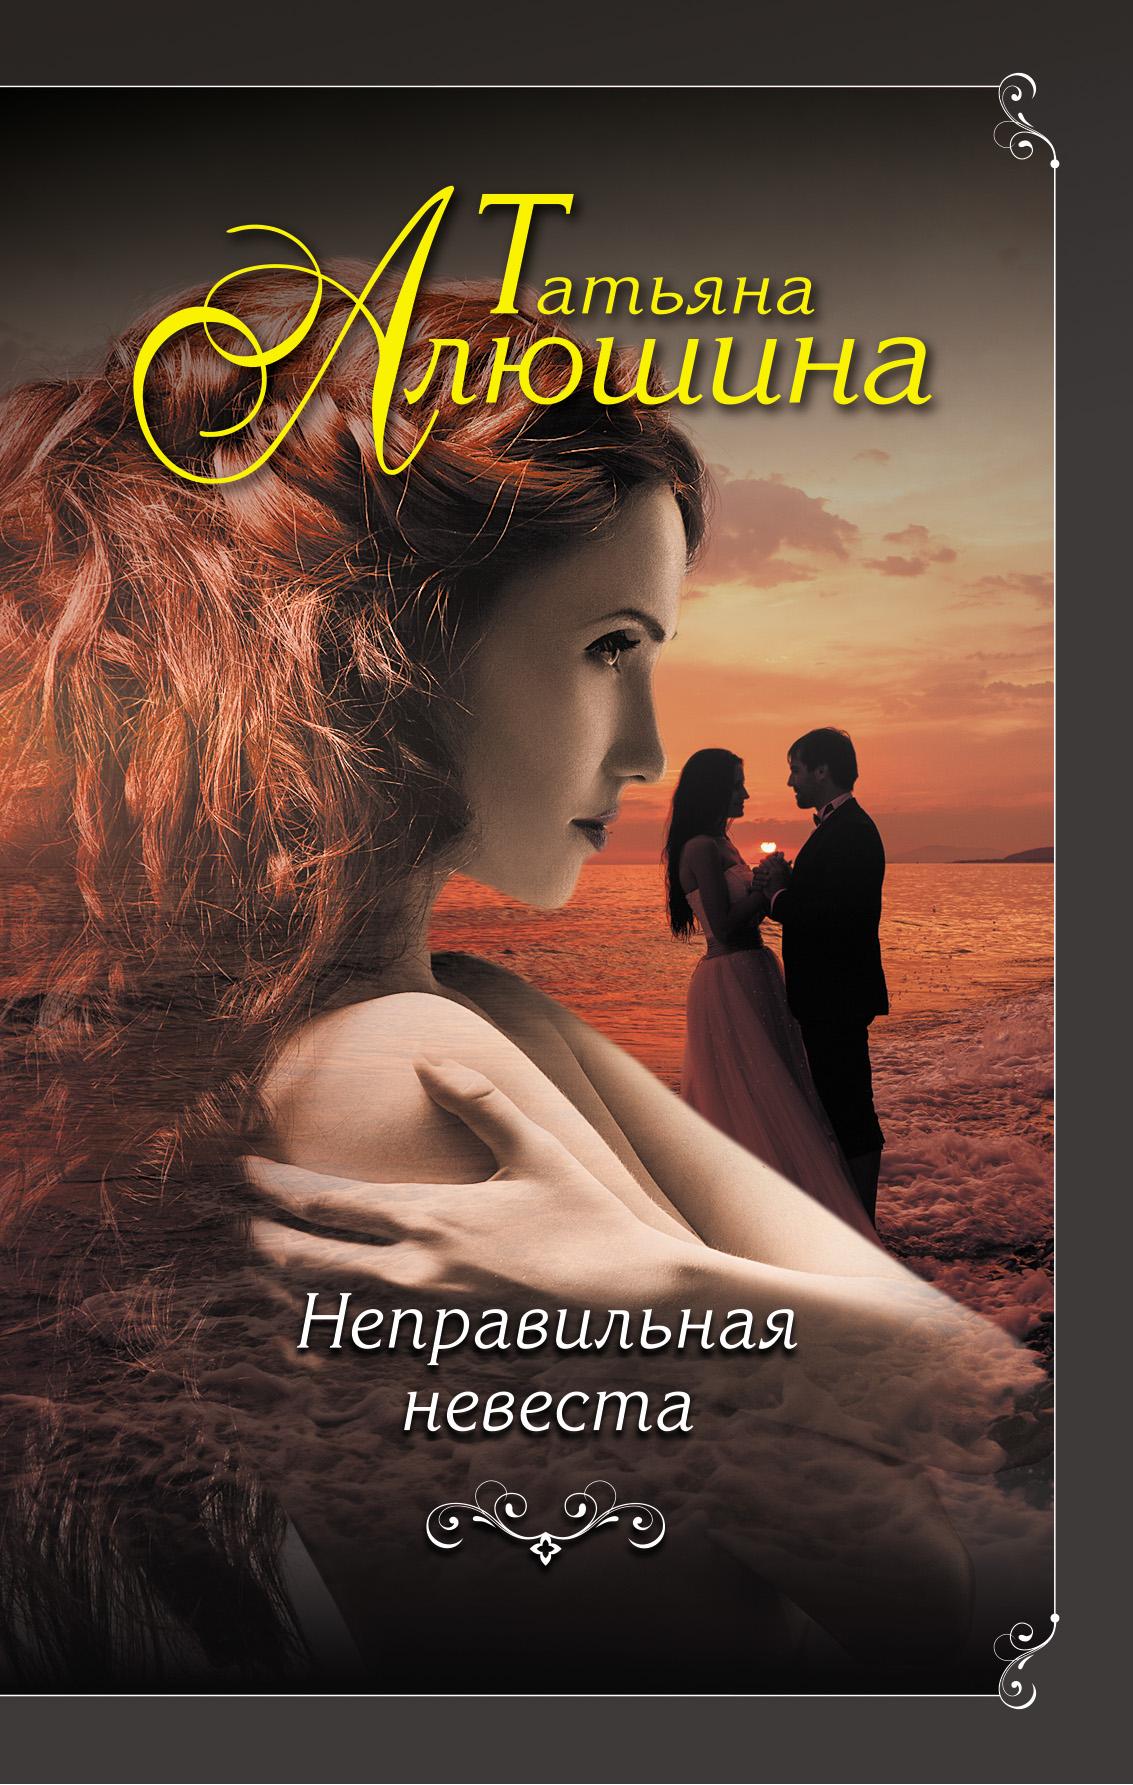 цена на Татьяна Алюшина Неправильная невеста